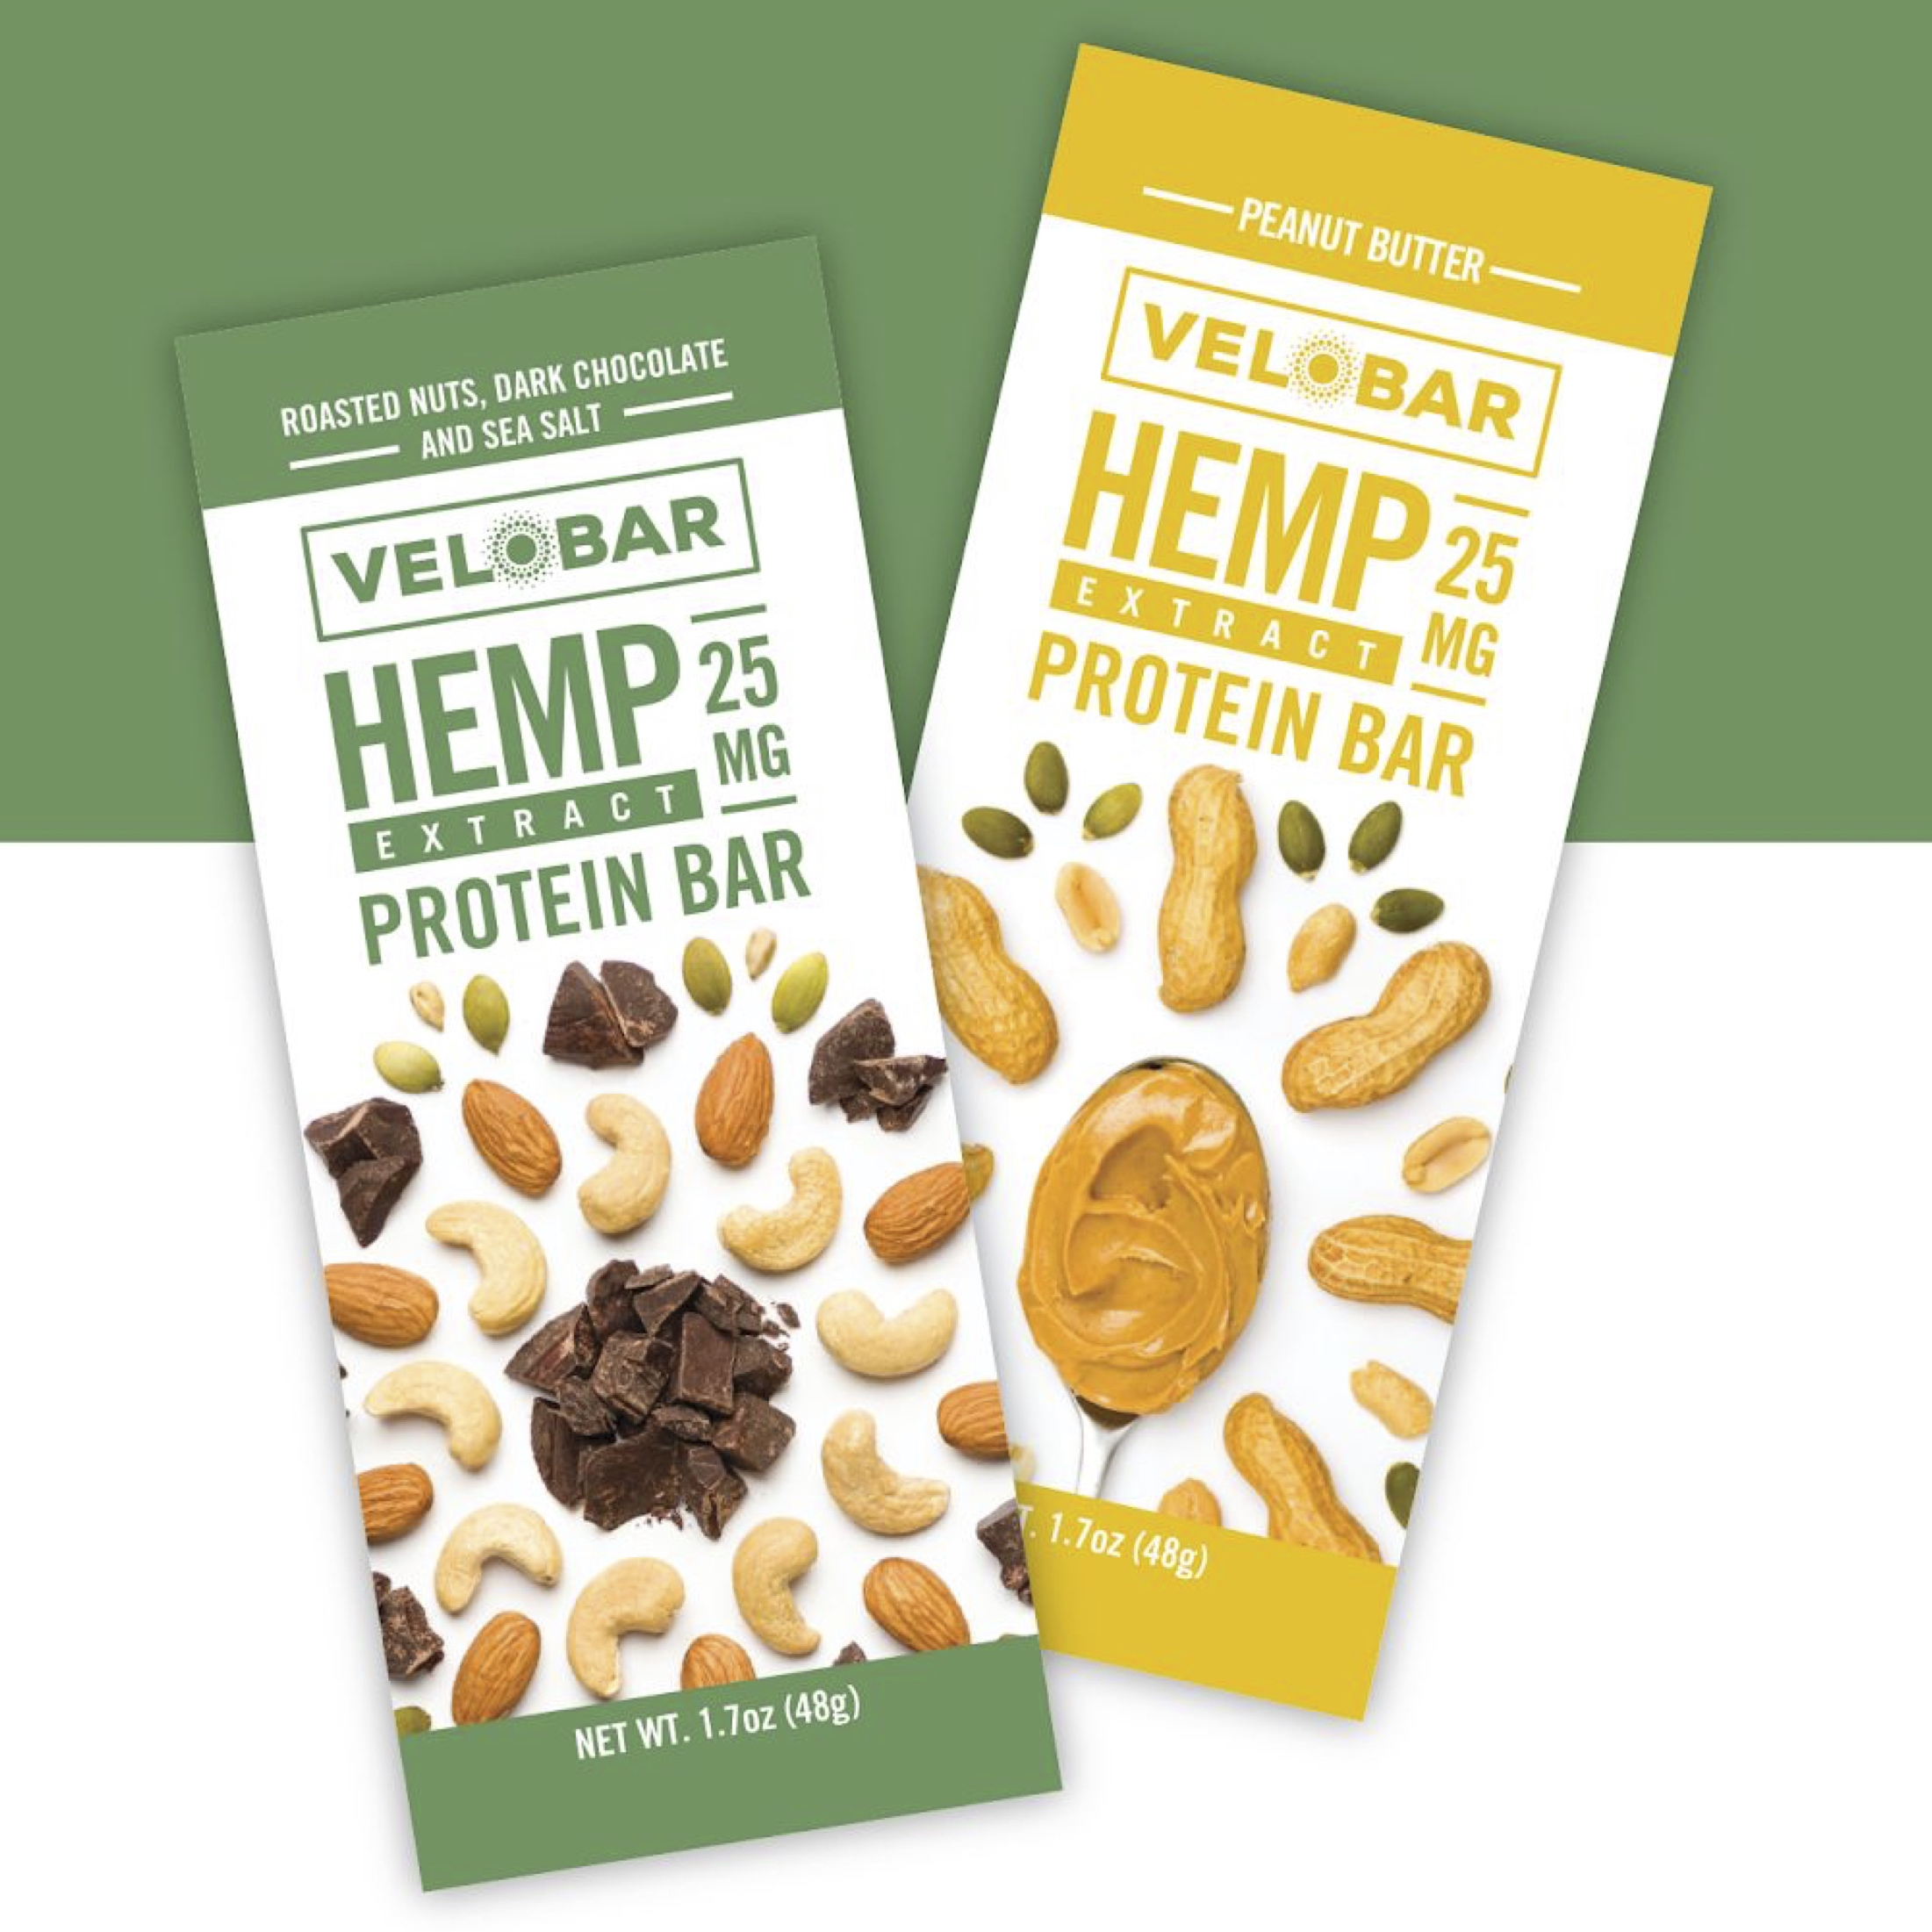 velobar-hemp-extract-protein-bar-mix-4-pack.jpg